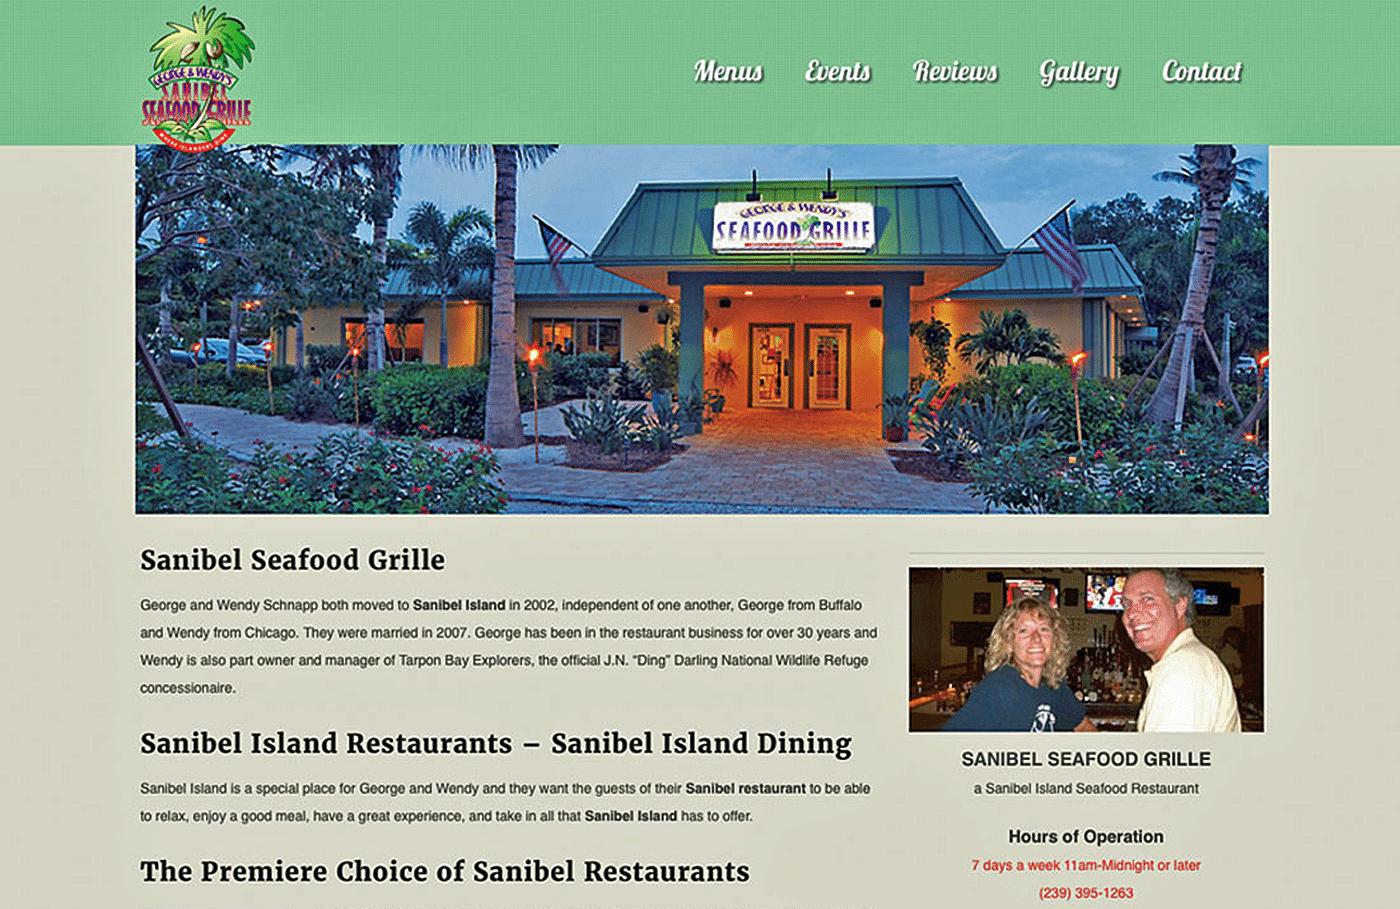 Restaurant Website Design Agency | Restaurant Website Design Creative for SSG